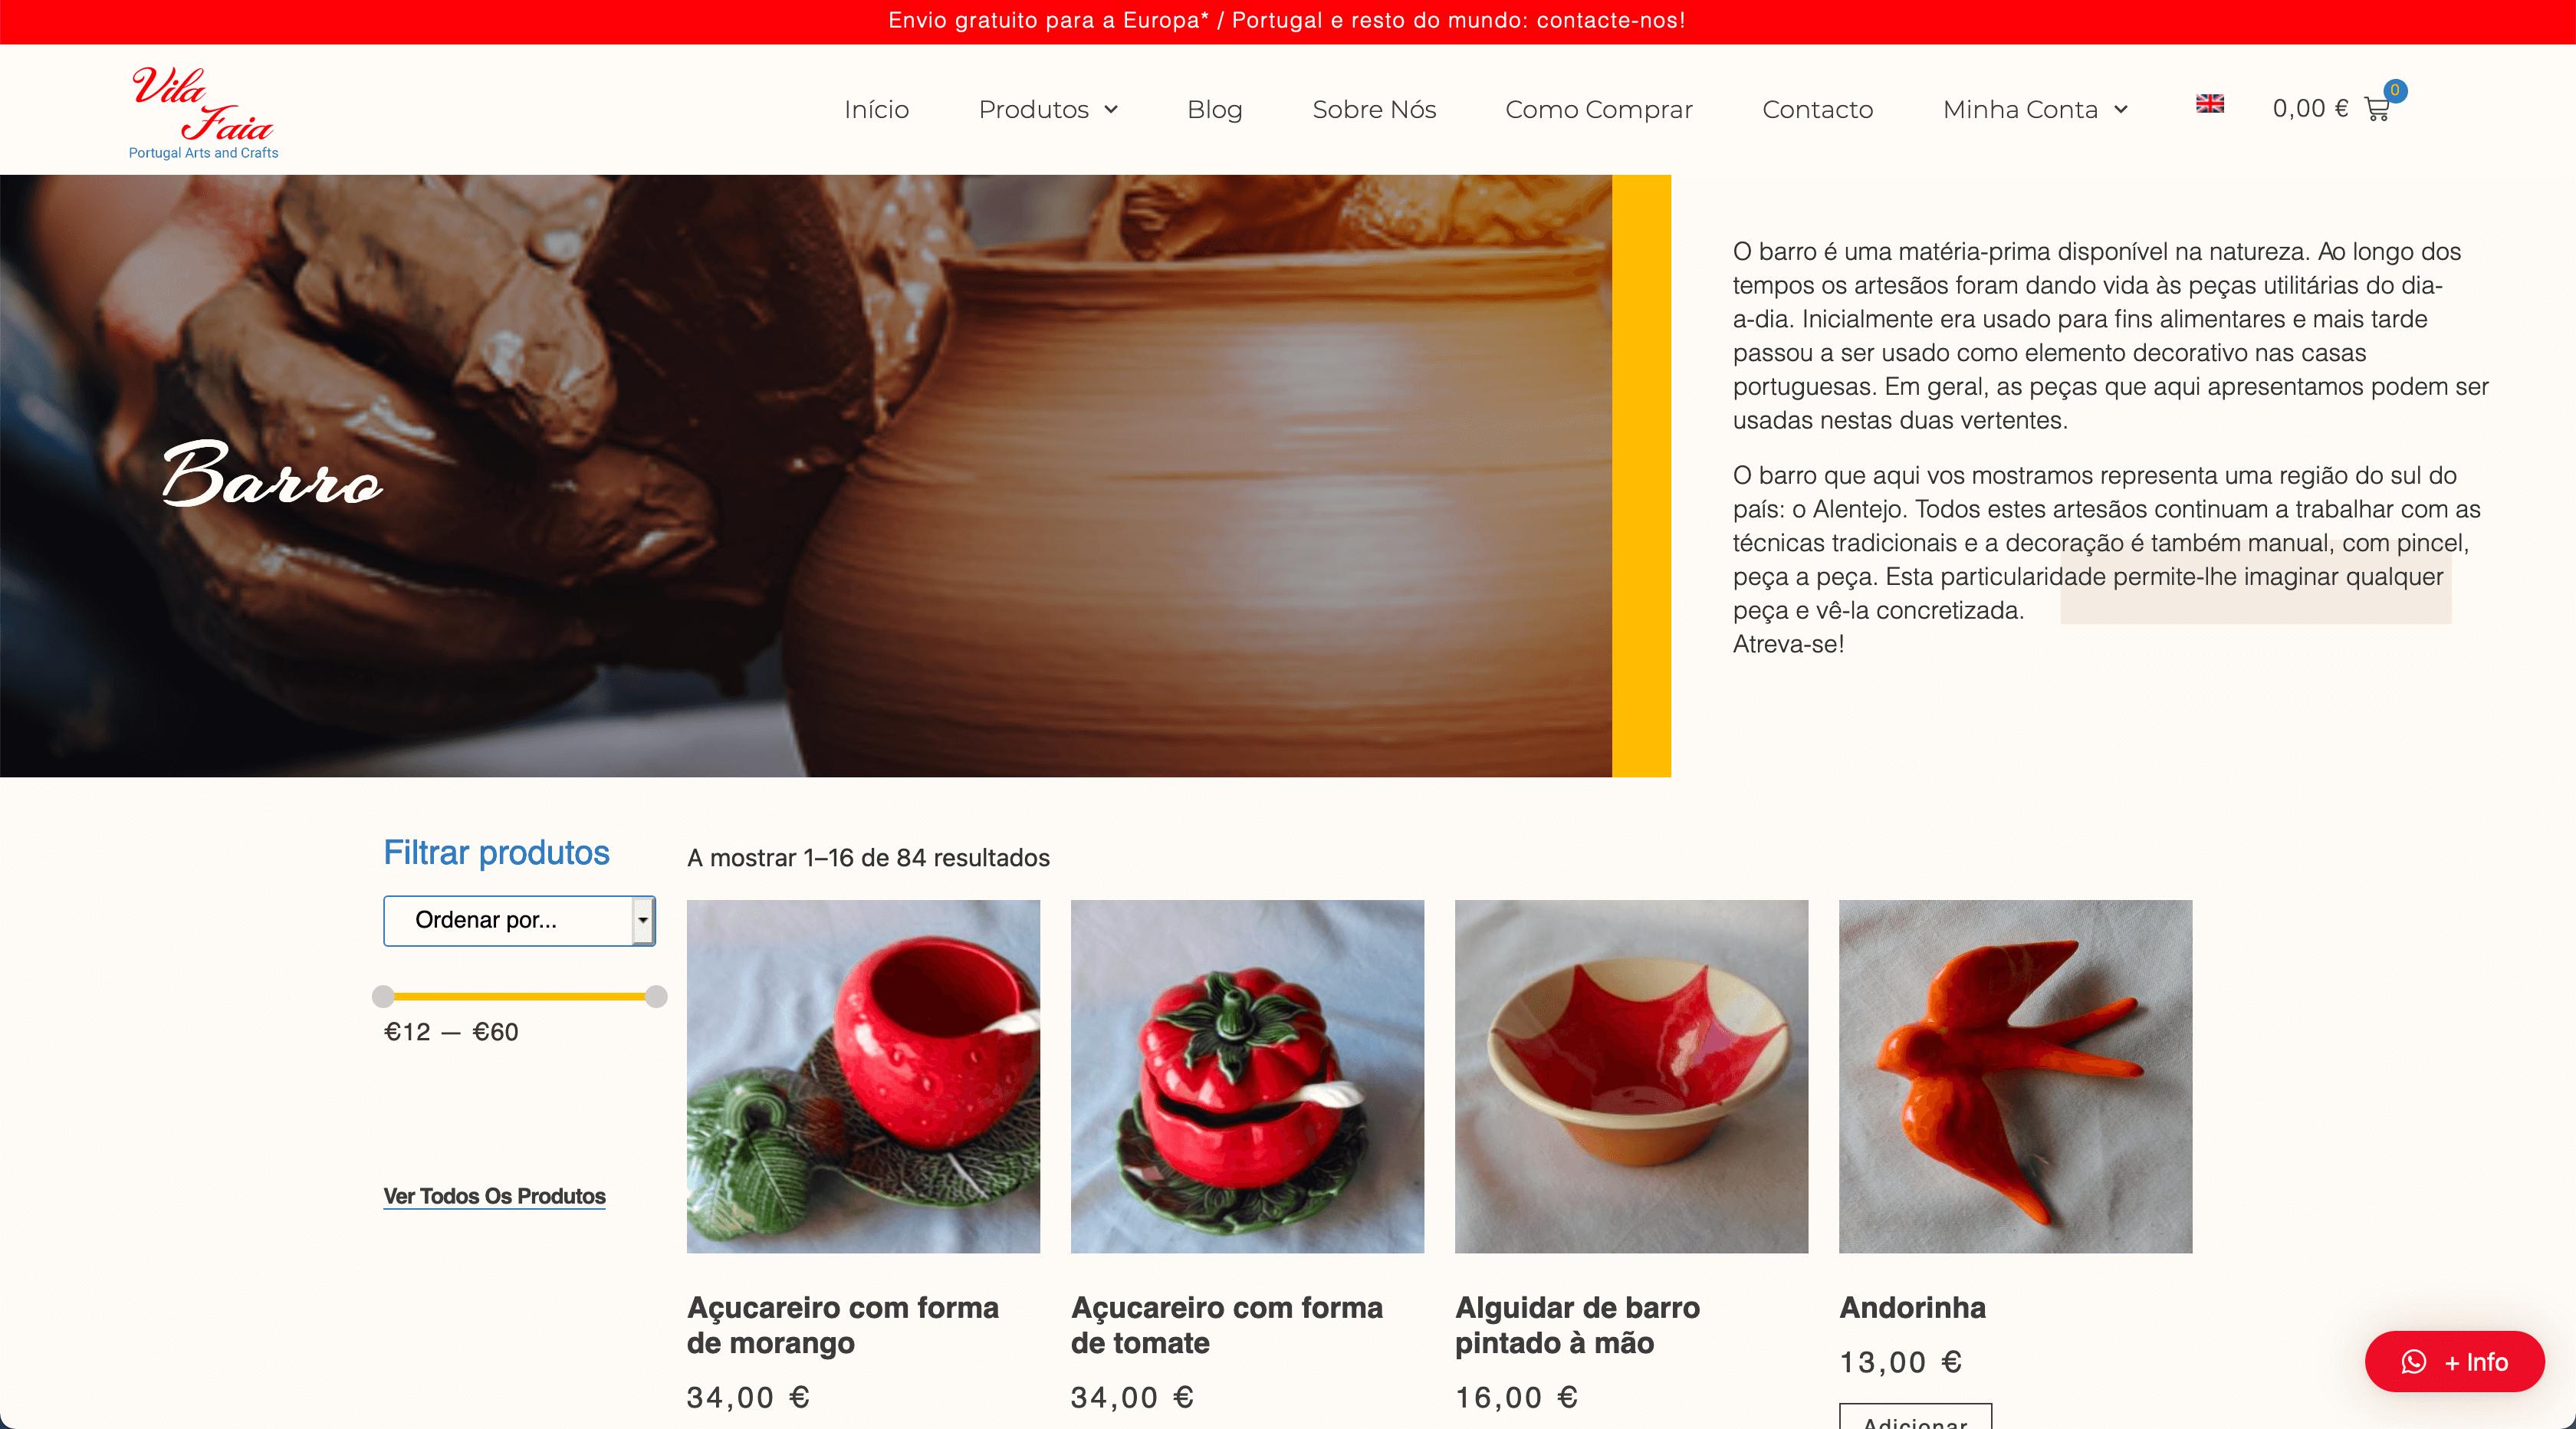 vila-faia-portugal-online-lab-web-development-web-design-5